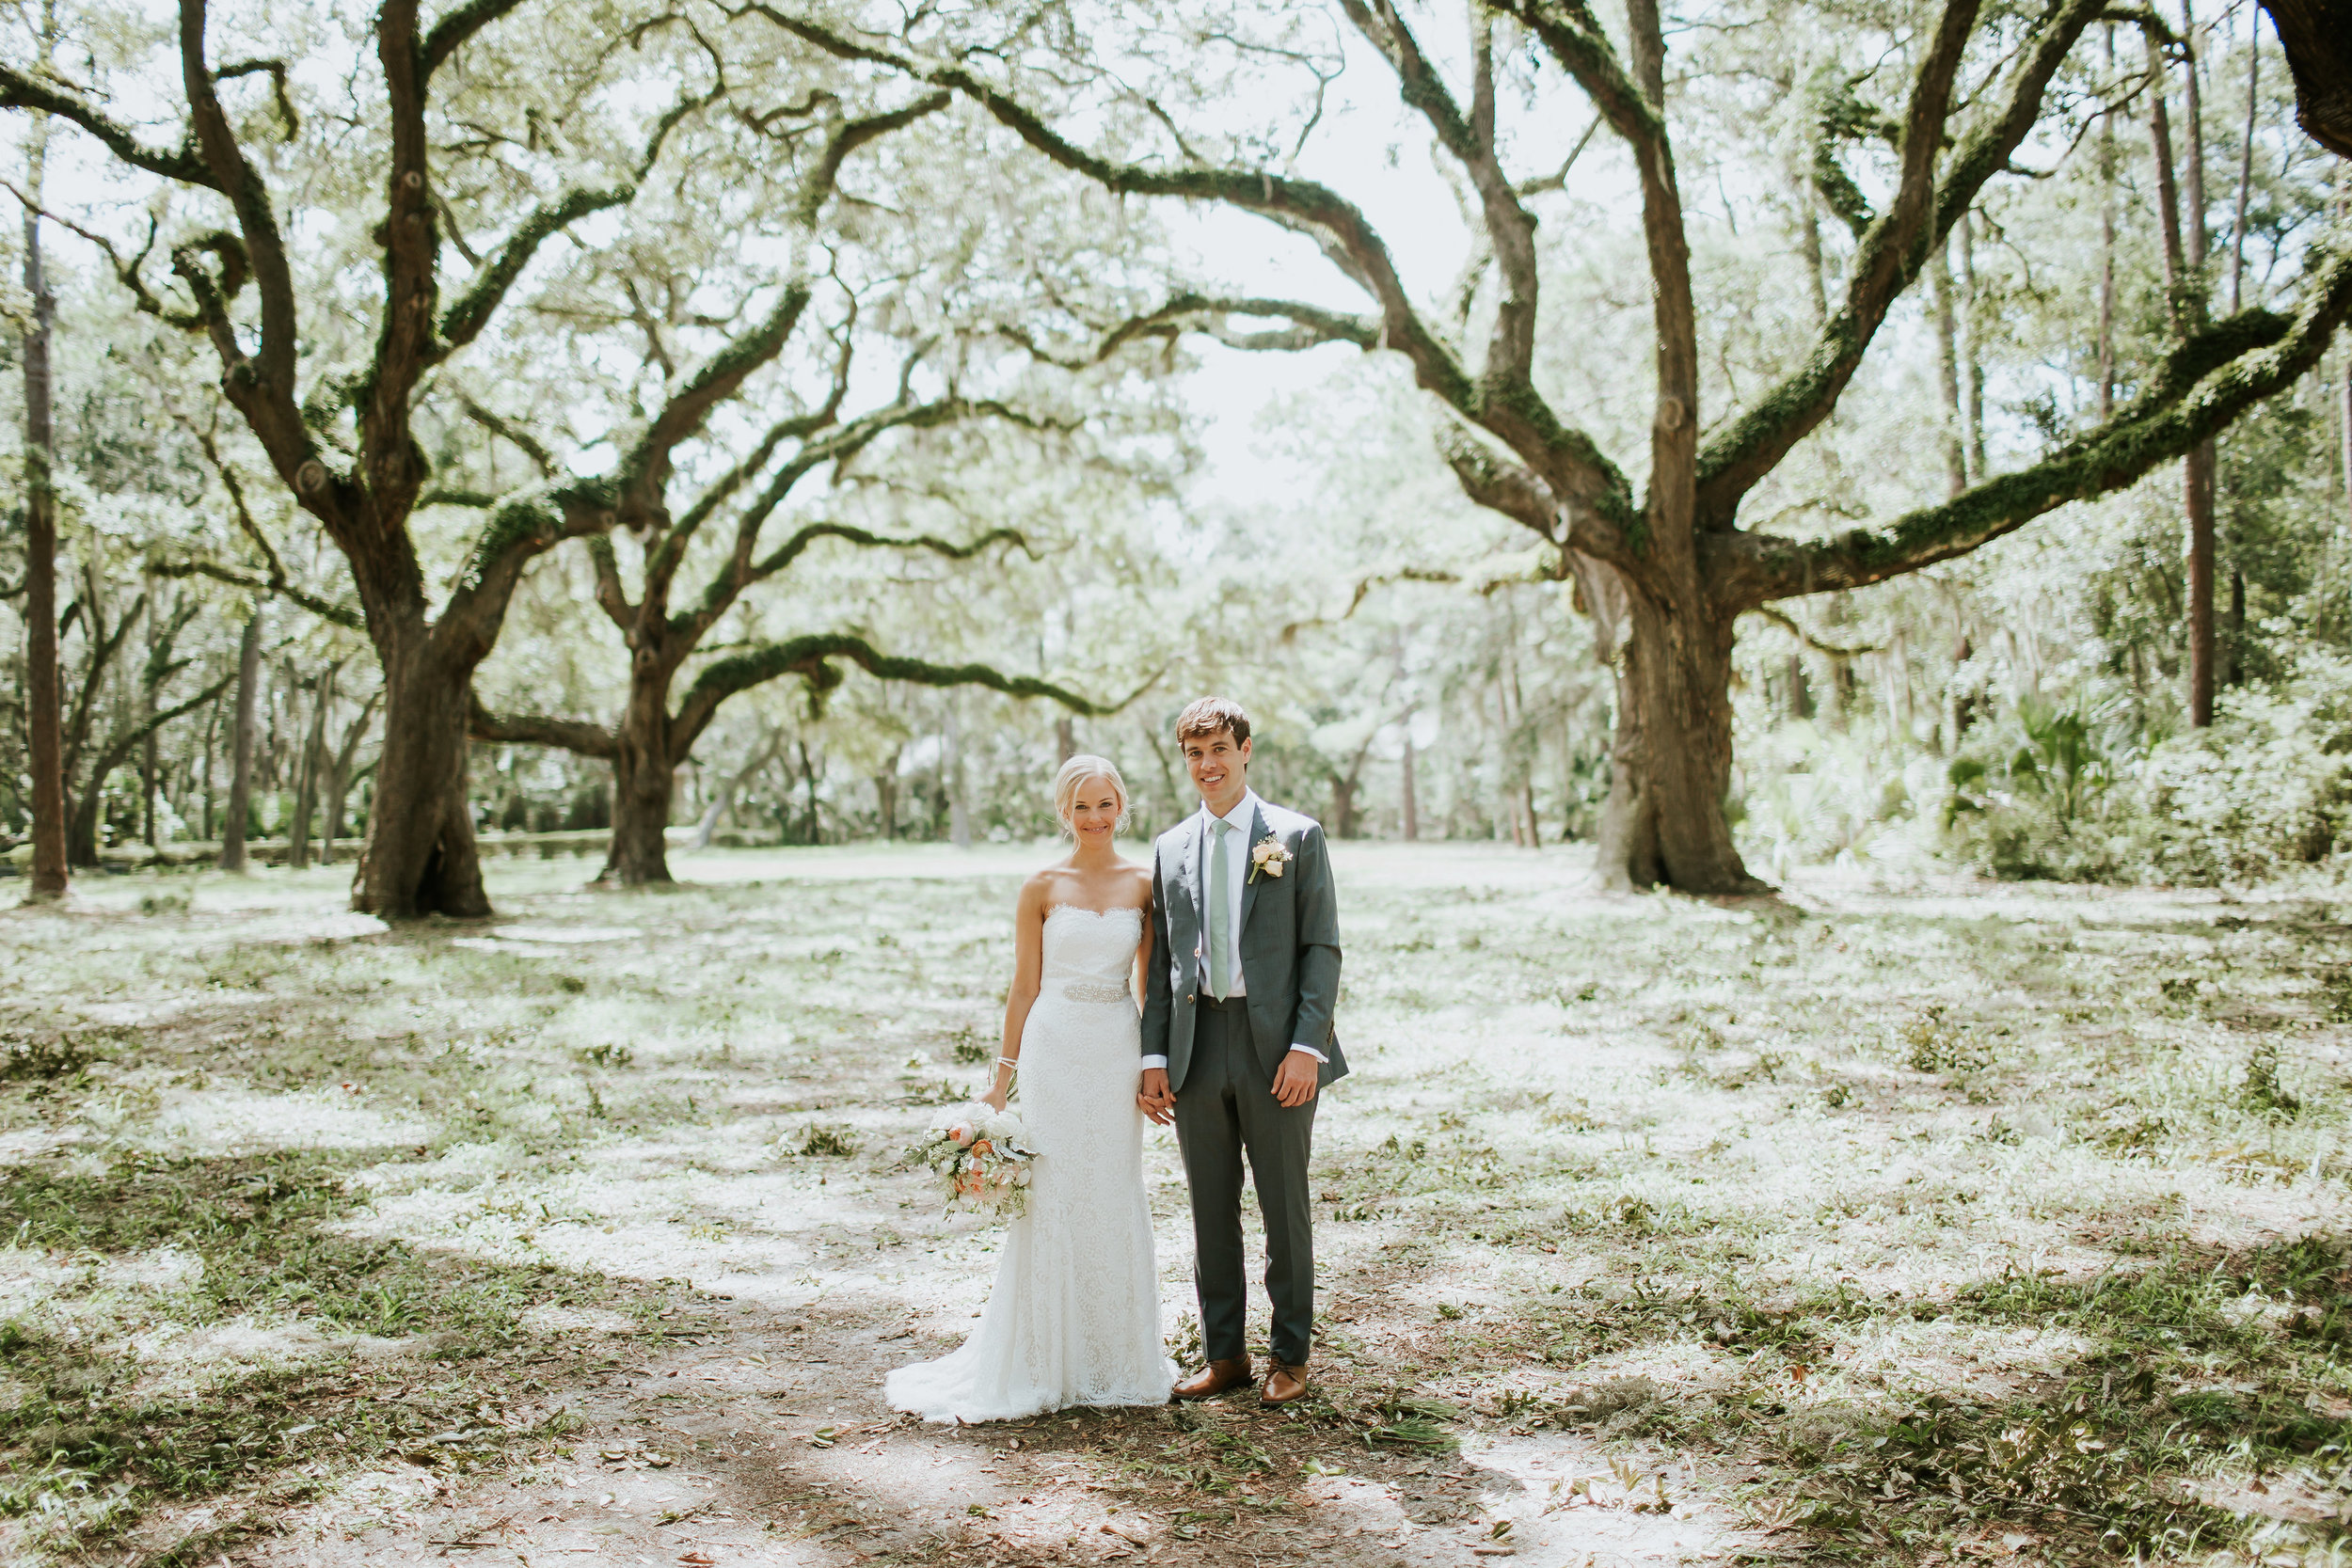 Katie & Bryant's Omni Hilton Head Resort wedding by Carrie Friesen Photography